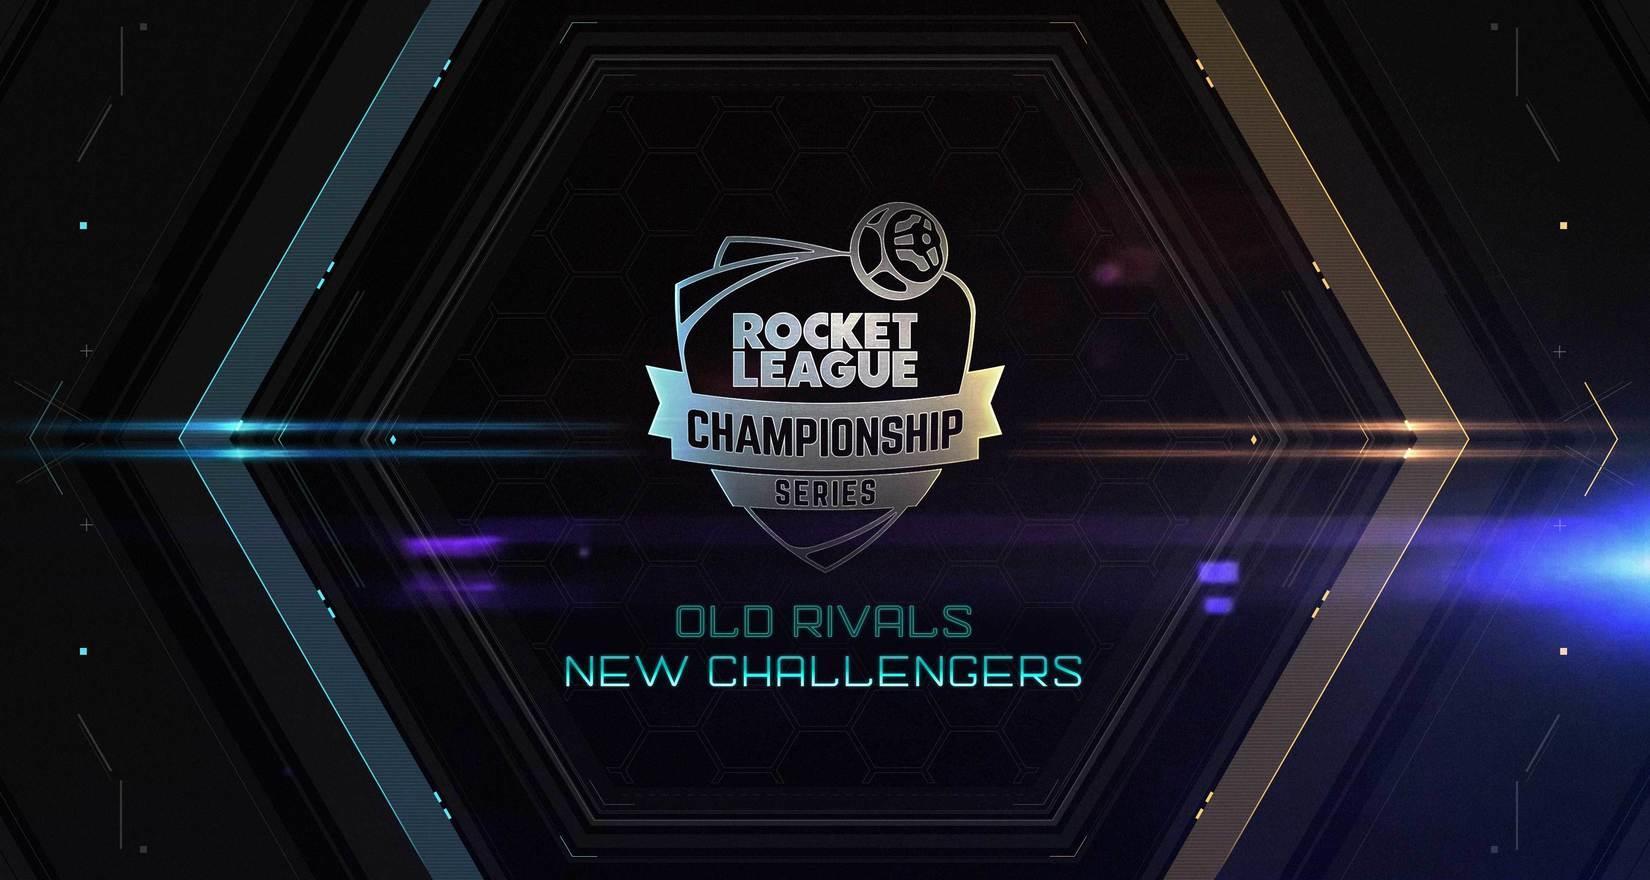 Rocket League Championship Series (Season 3) begins March 2017